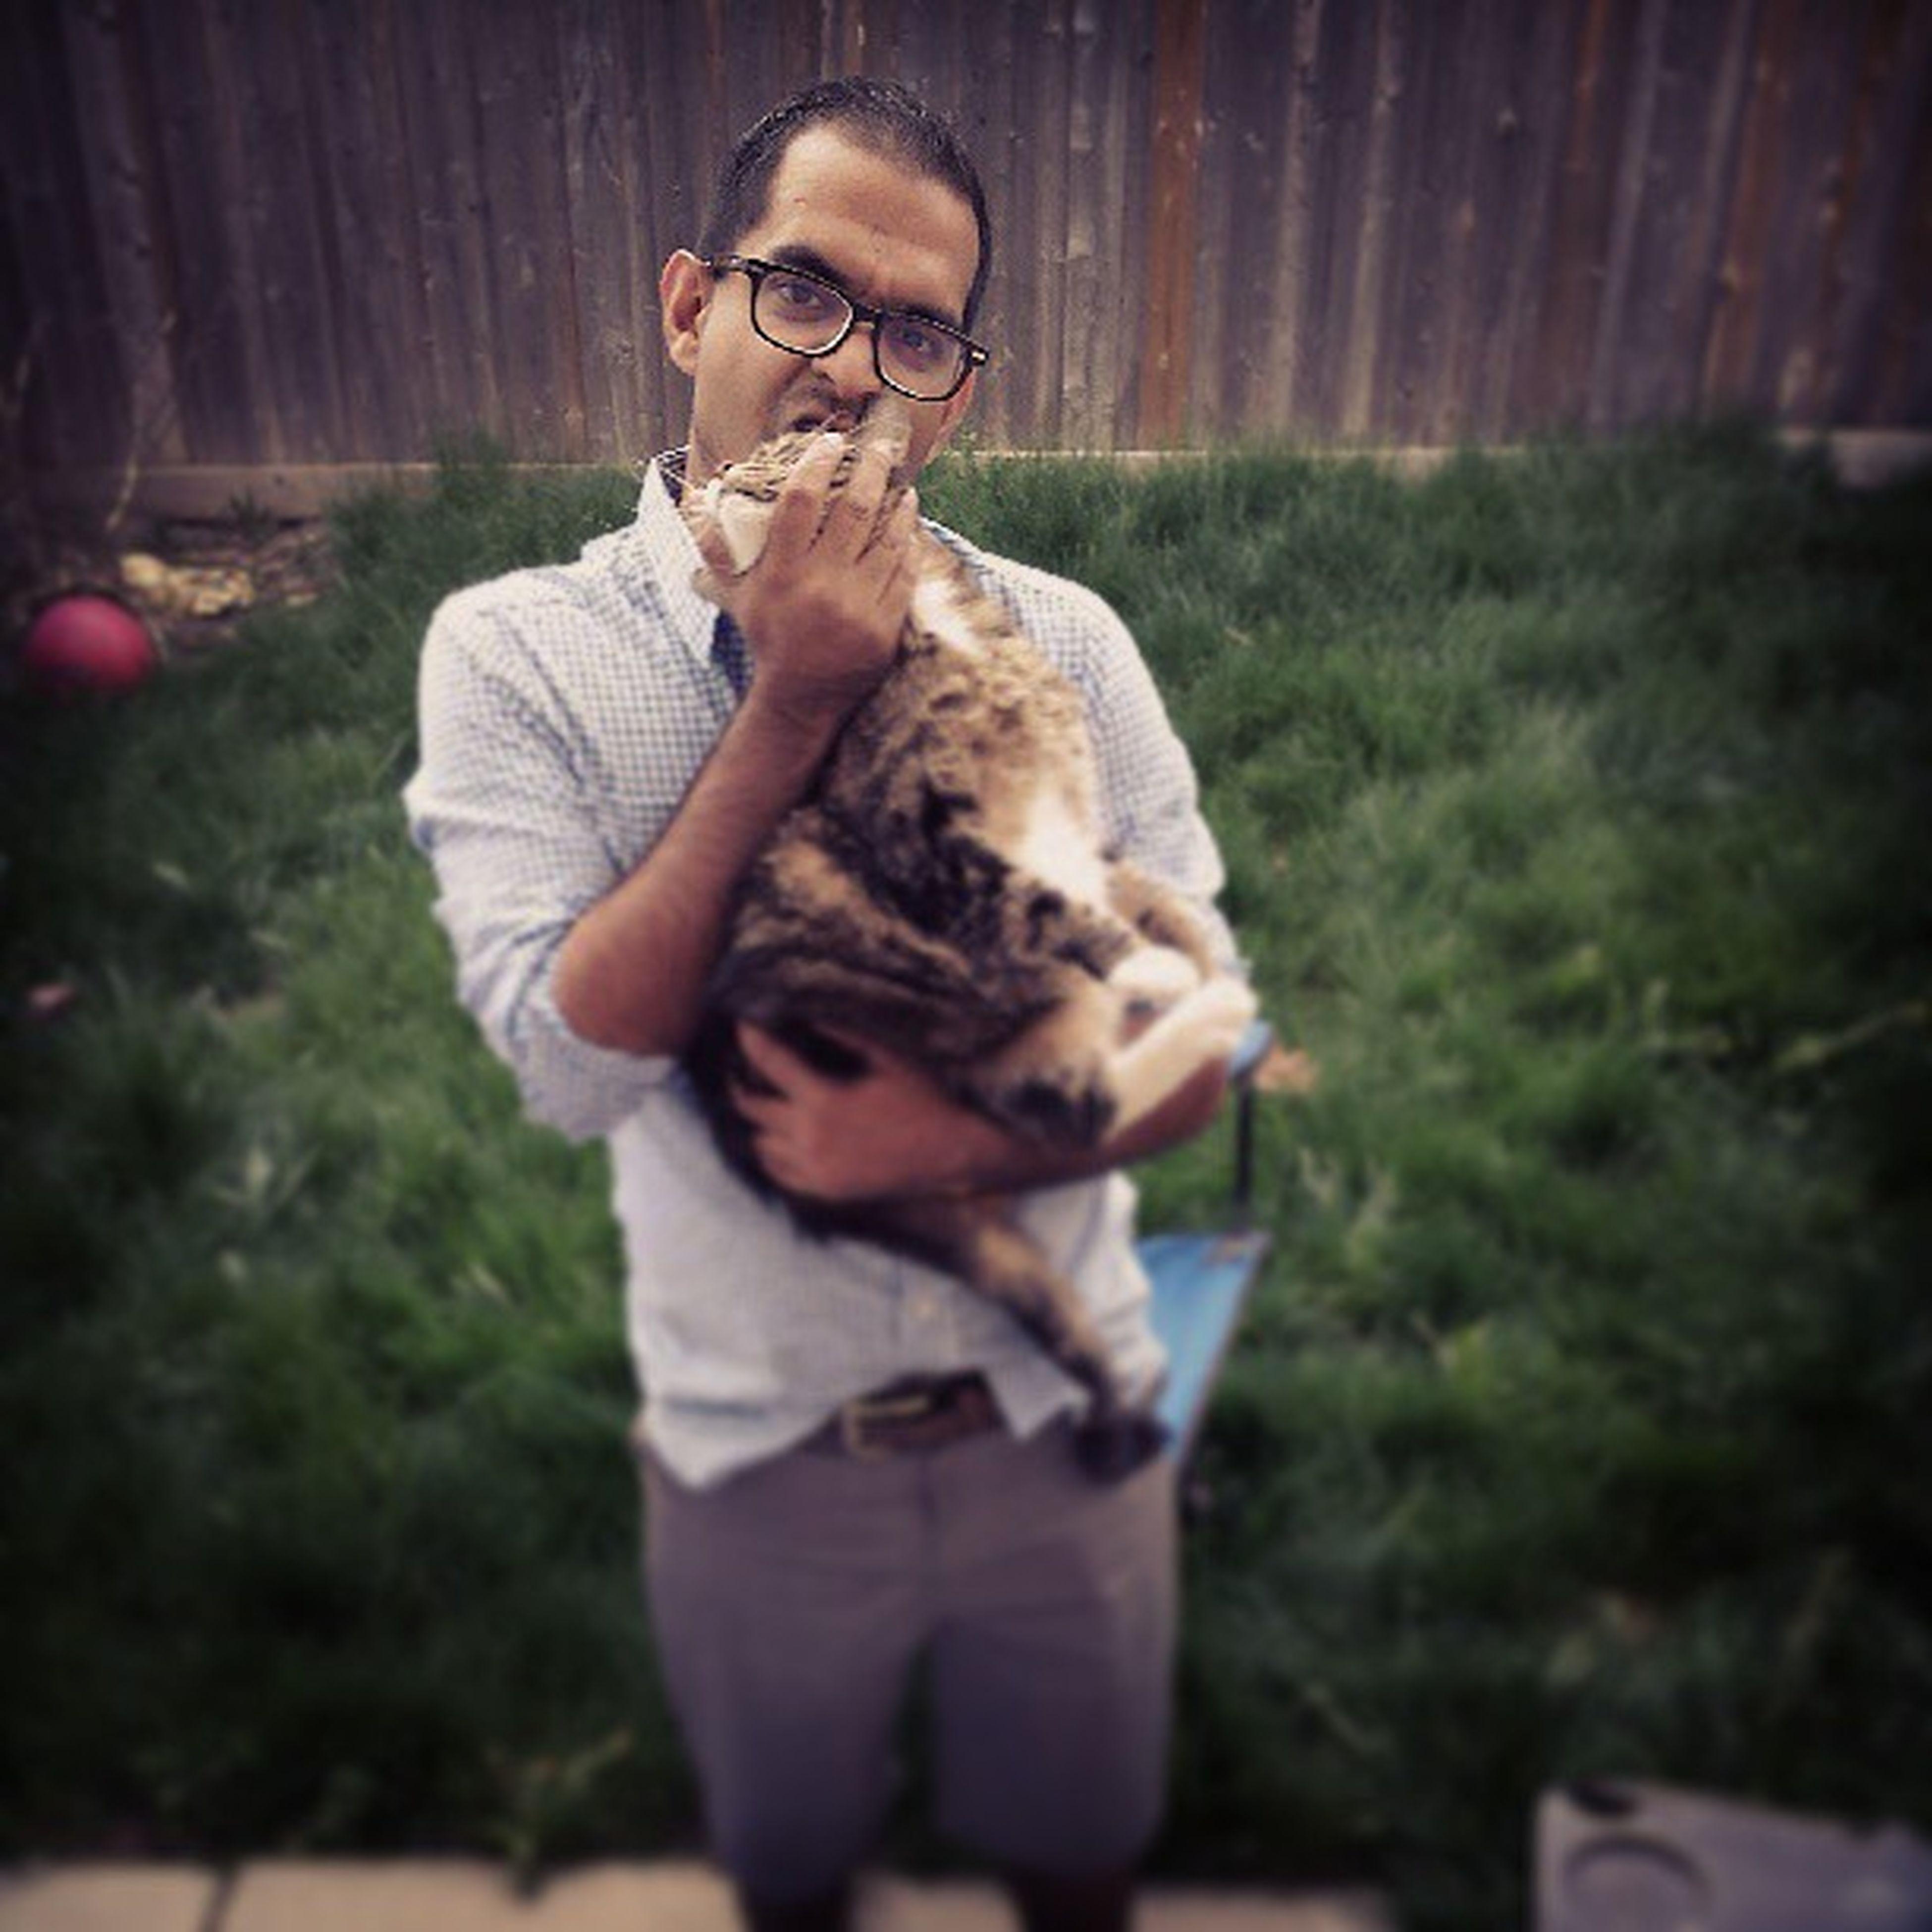 @abossmon eating pepsi the cat. Gamenight Dontgo Myencyclopedia